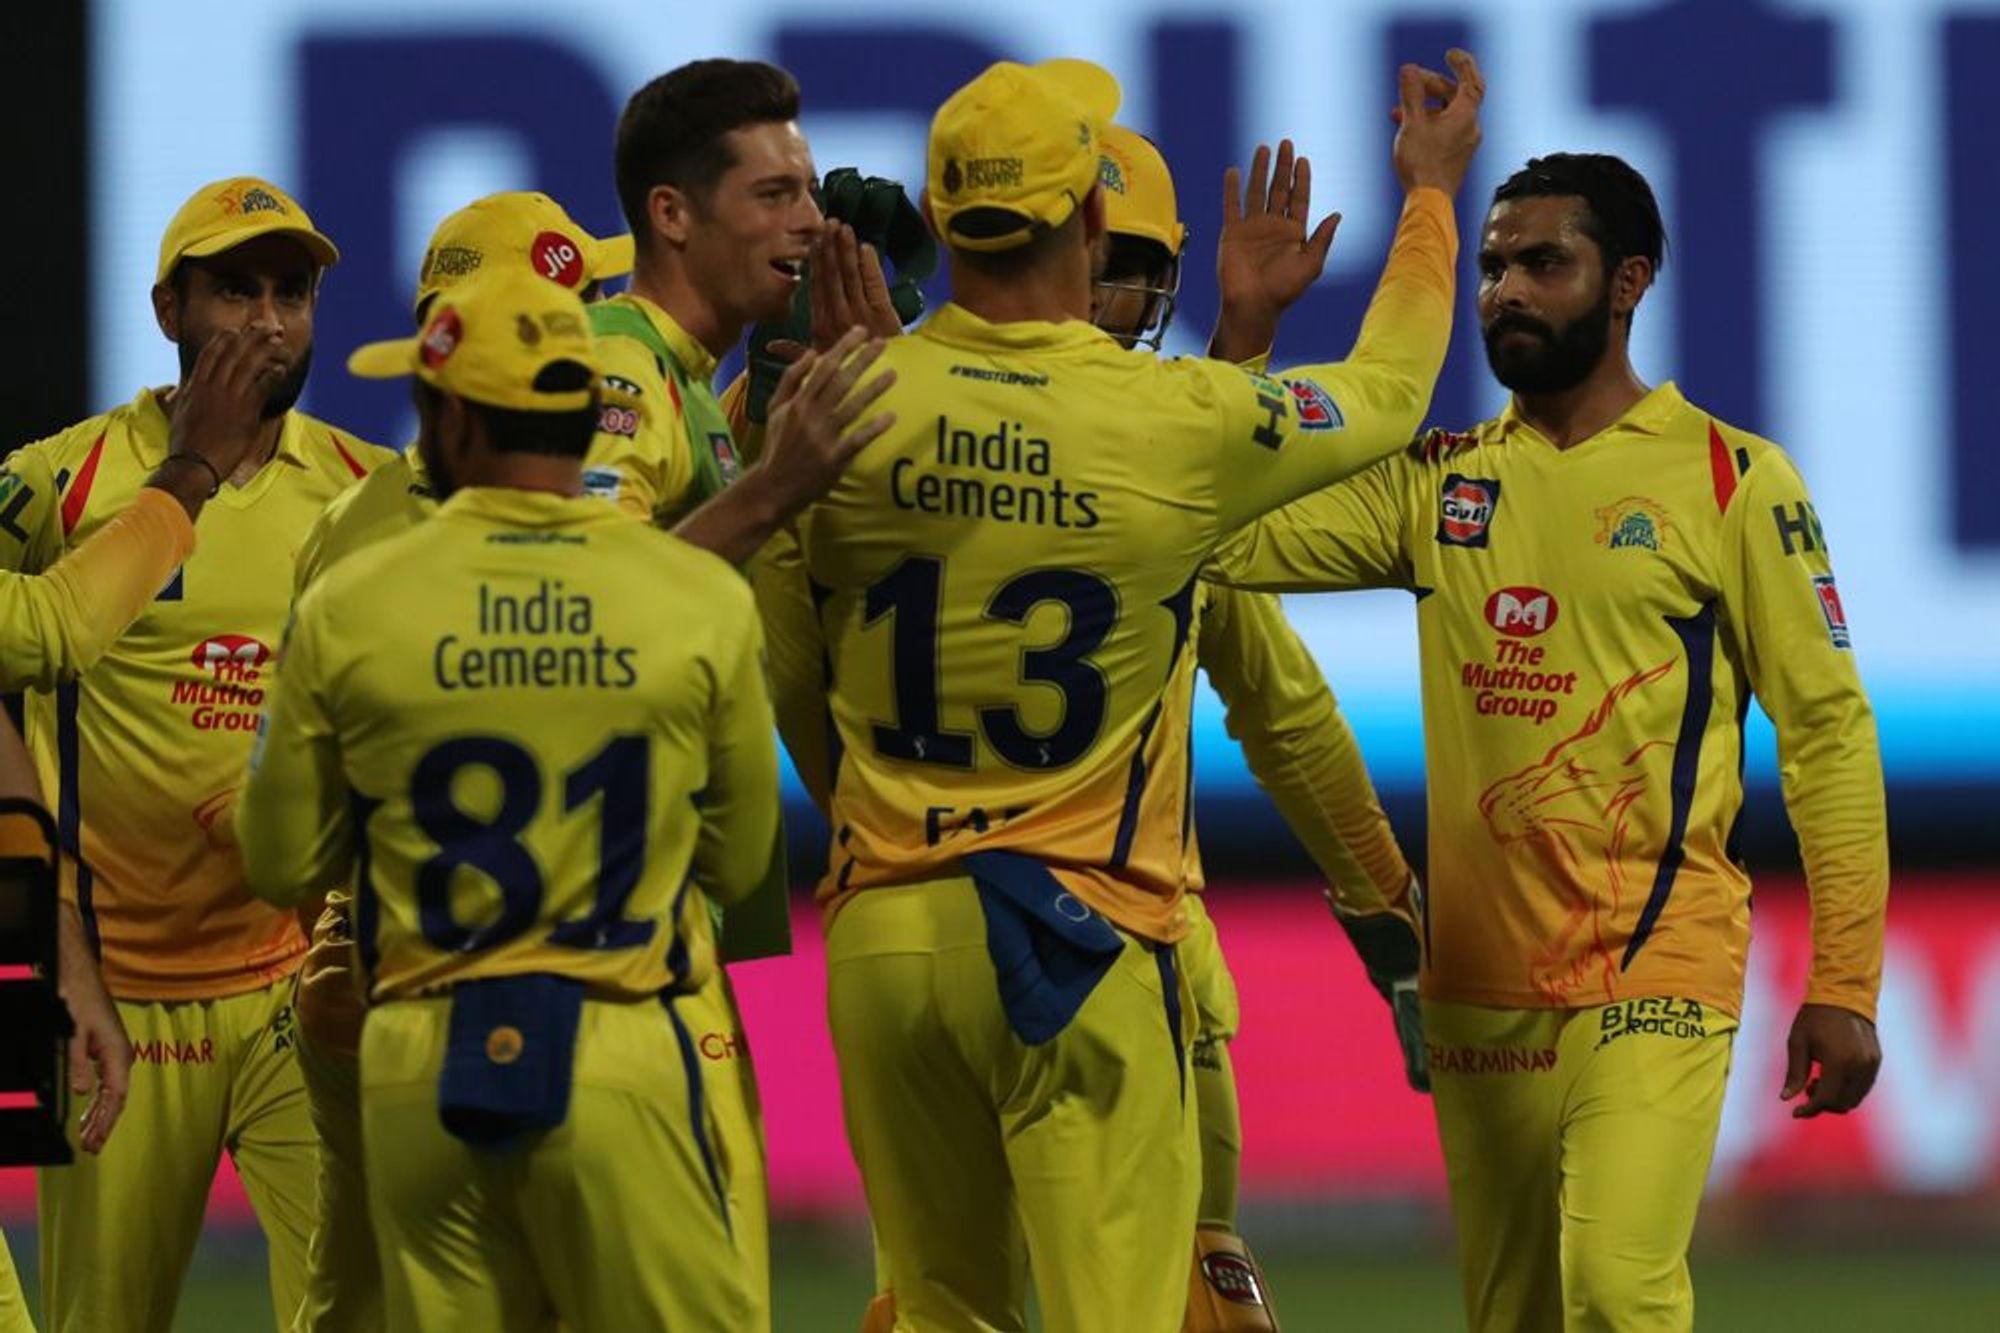 CSK to win IPL, Mumbai second: Prediction Market